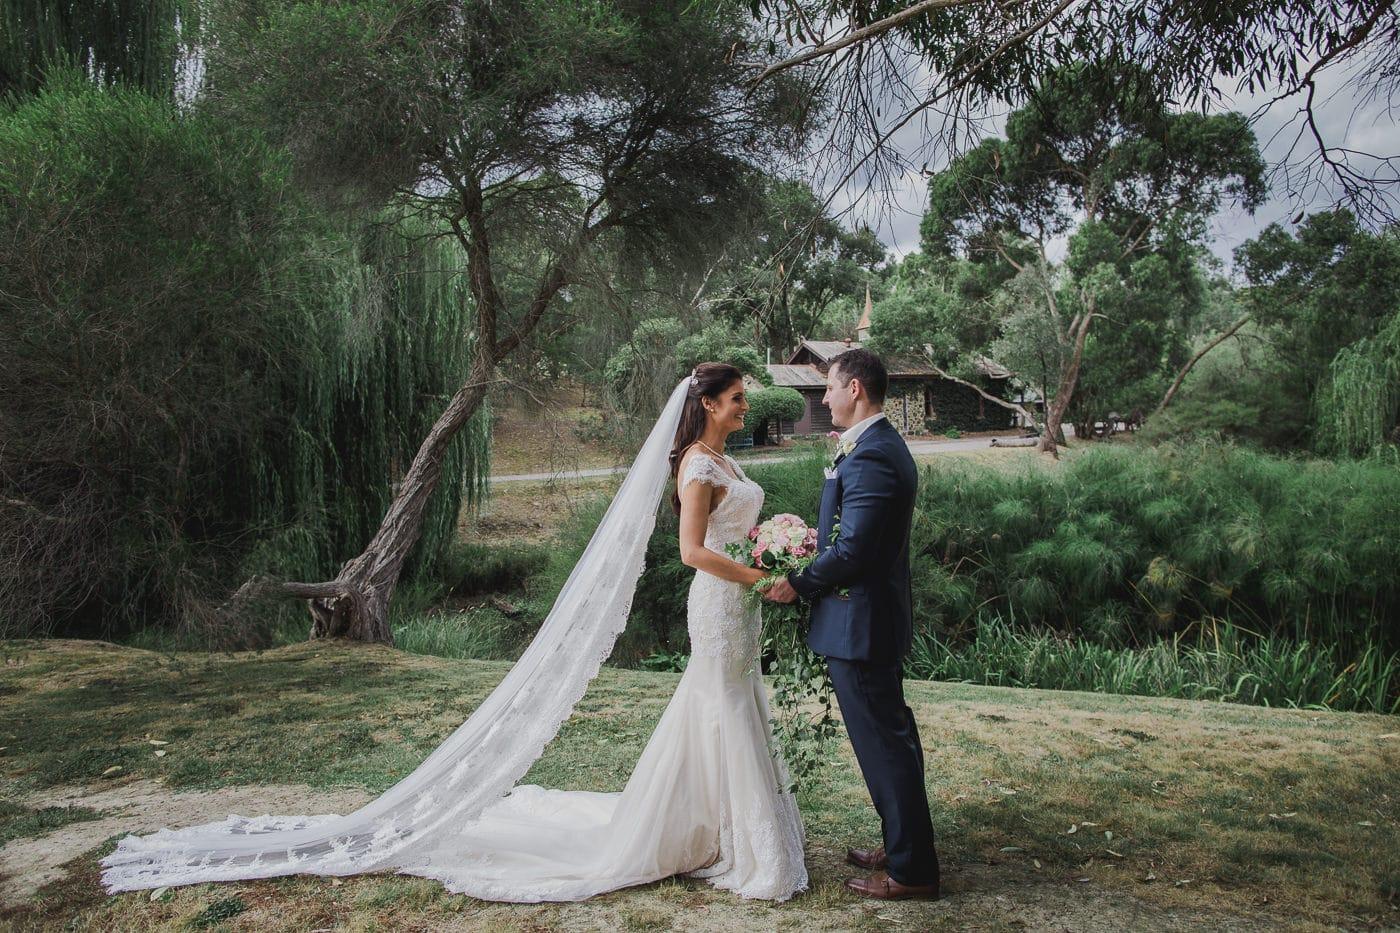 Best Wedding Photos in Melbourne - Bridal Couple in Melbourne Gardens